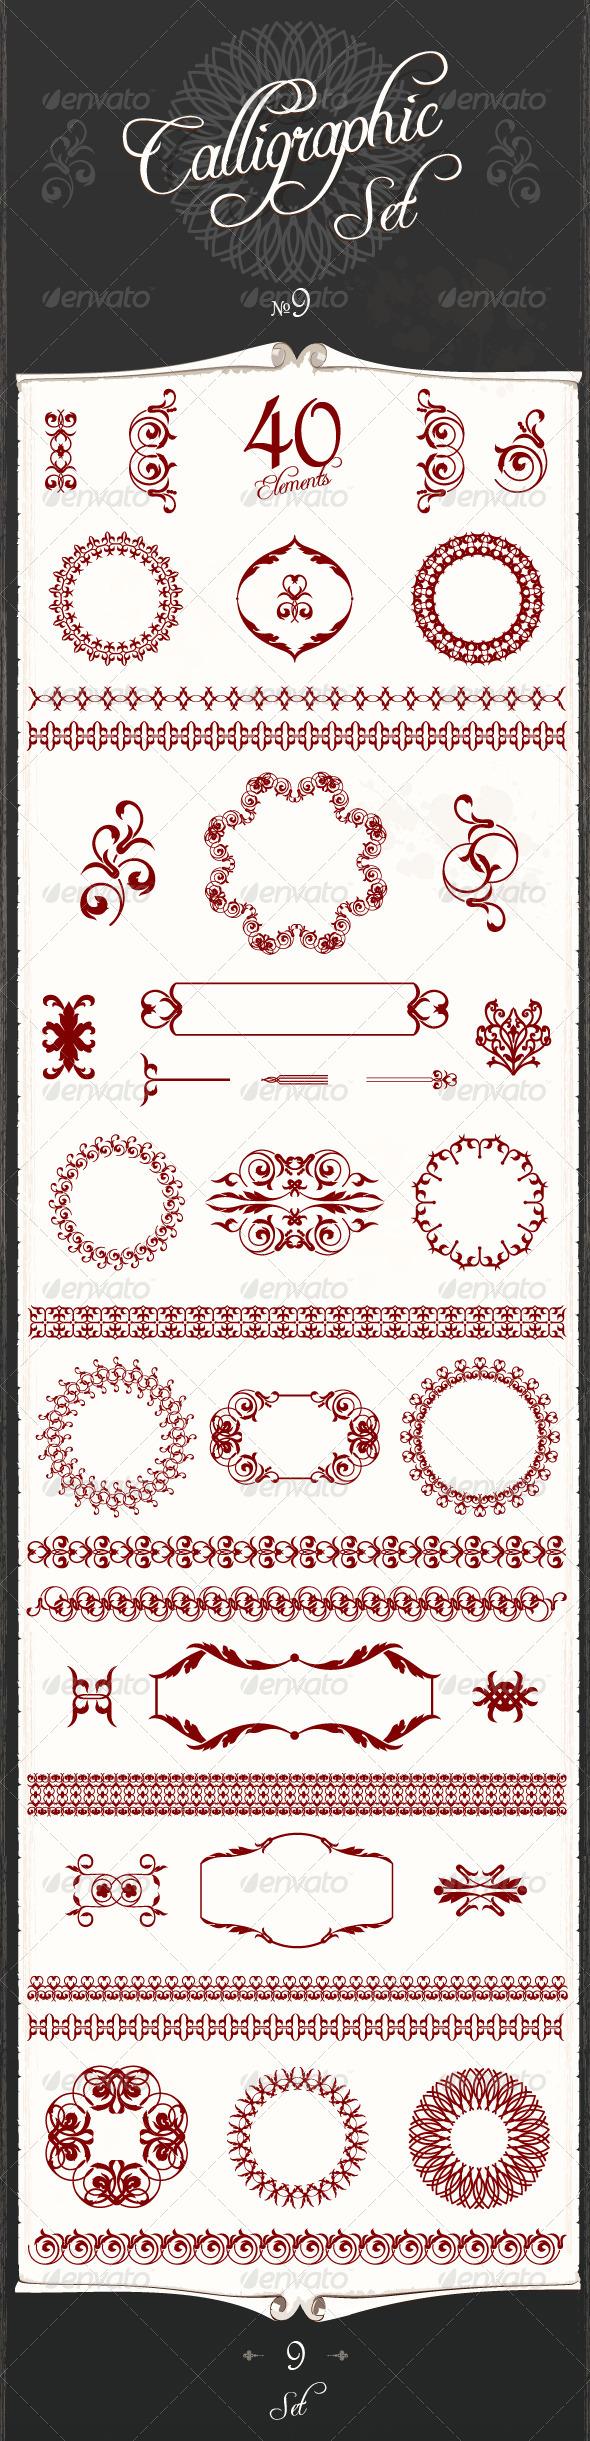 GraphicRiver Art Calligraphic Design Set 9 4547549